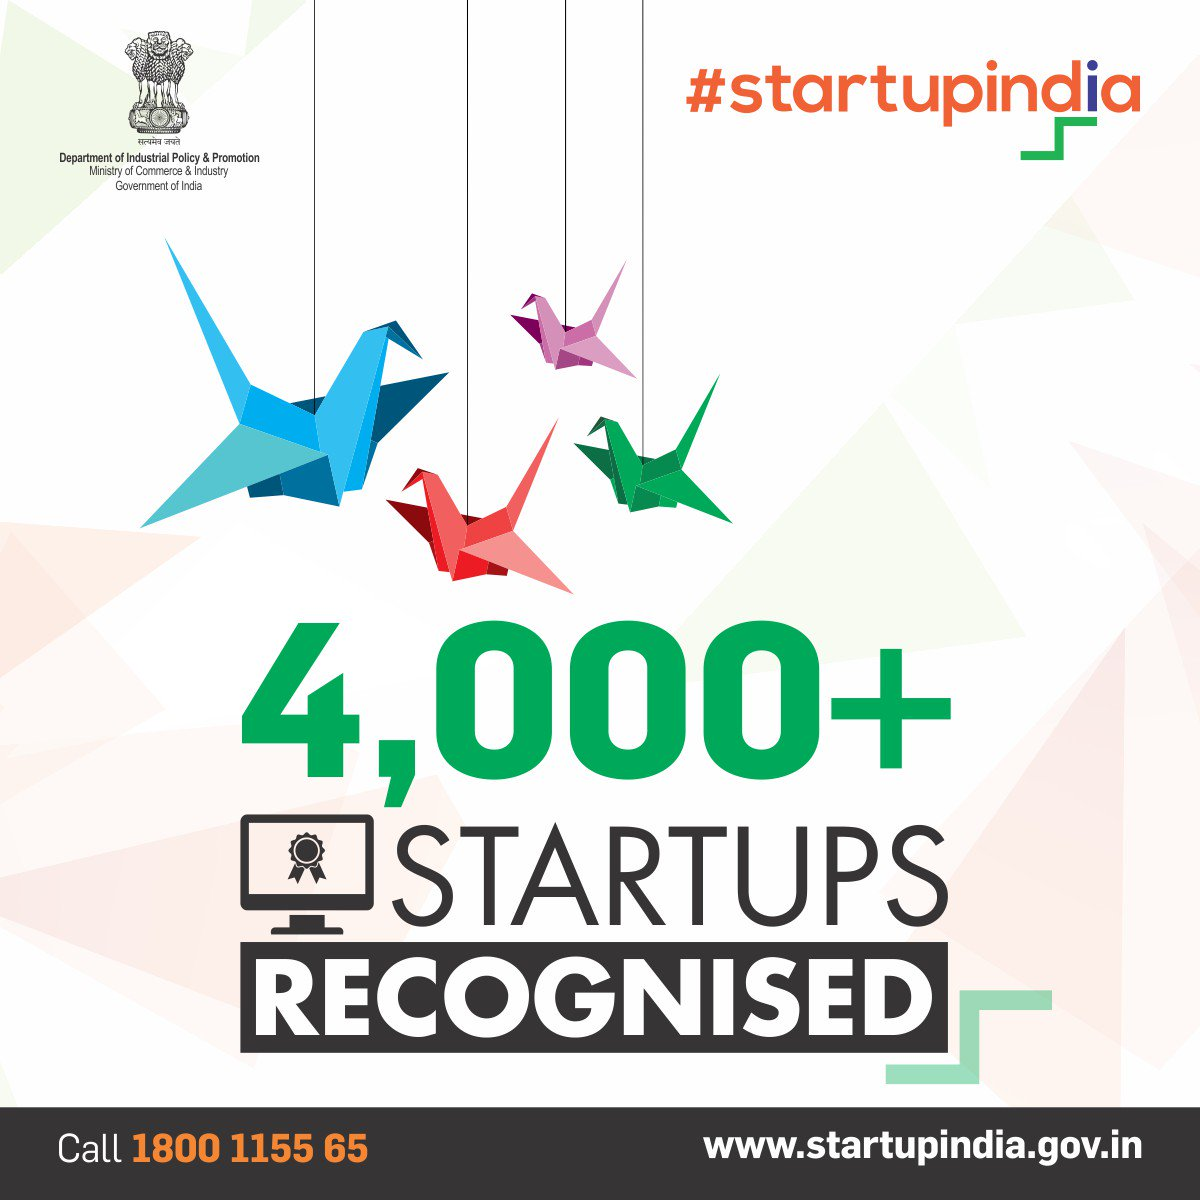 #StartupIndia has recognised over 4,000 #startups. Get your #startup  recognised at  http:// bit.ly/2omLwLE  &nbsp;   @CimGOI @sureshpprabhu @DIPPGOI<br>http://pic.twitter.com/RuZzhYKdjo